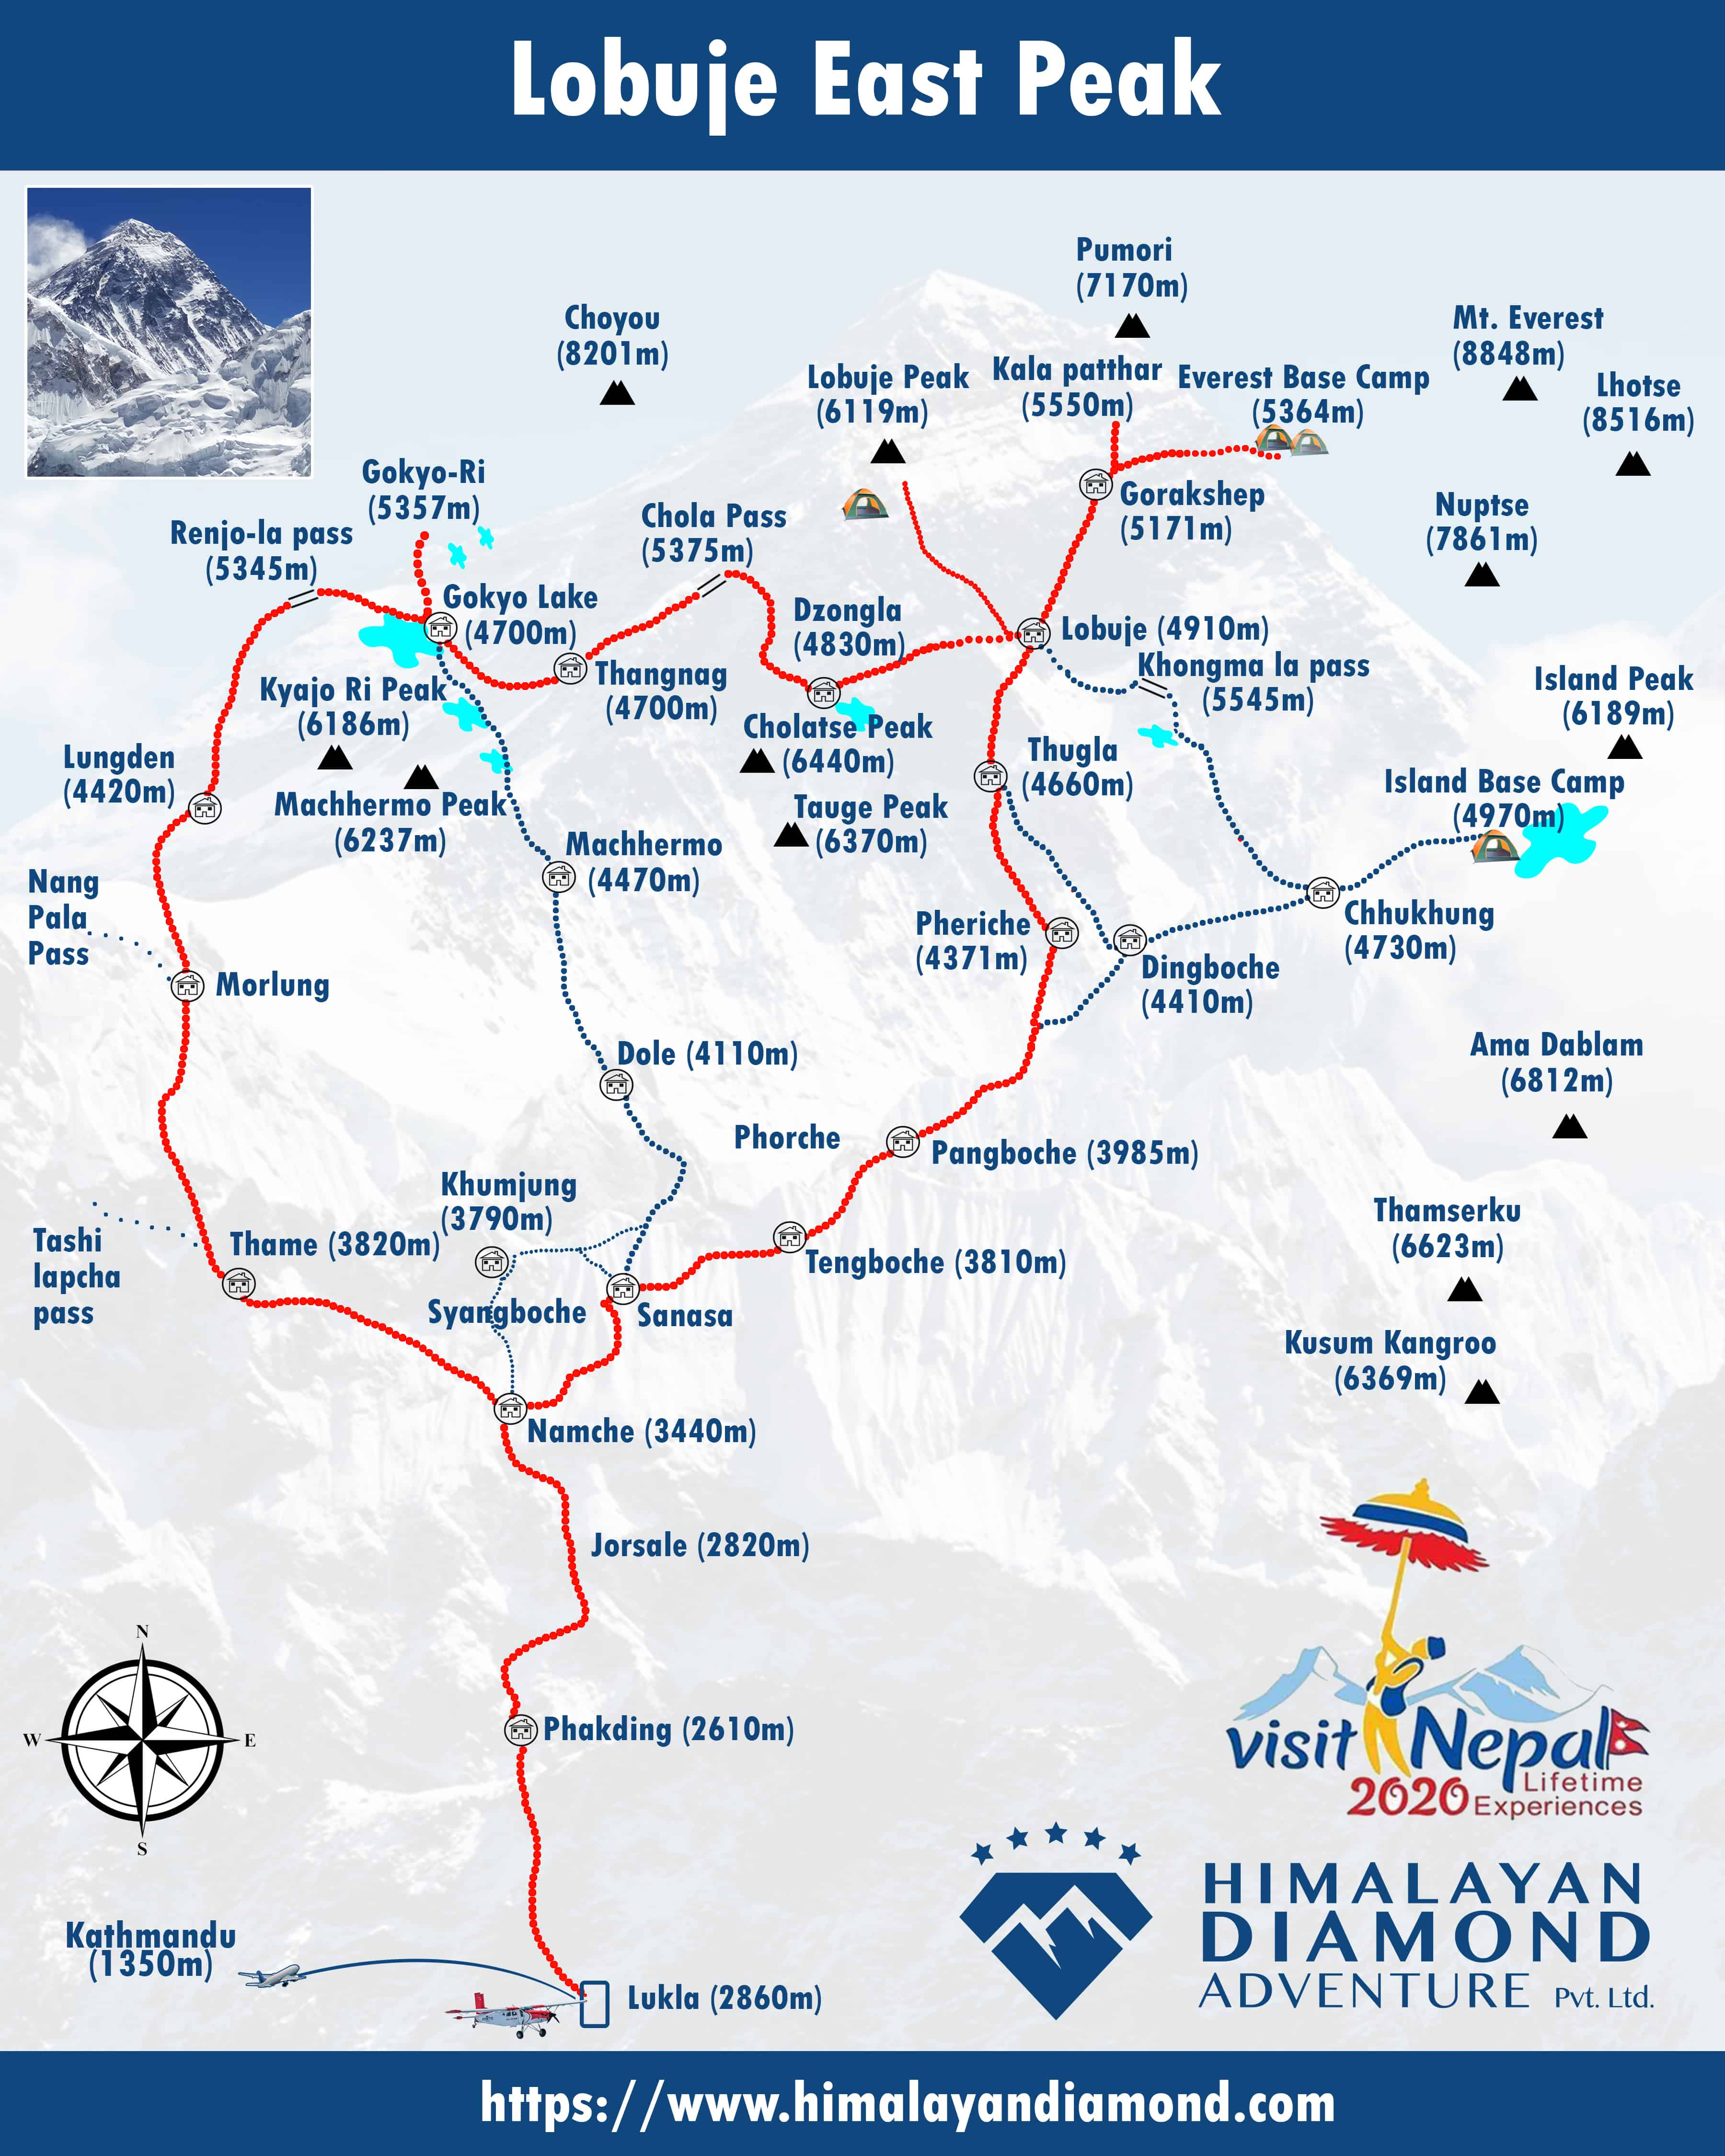 Lobuche East Peak Climbing Map